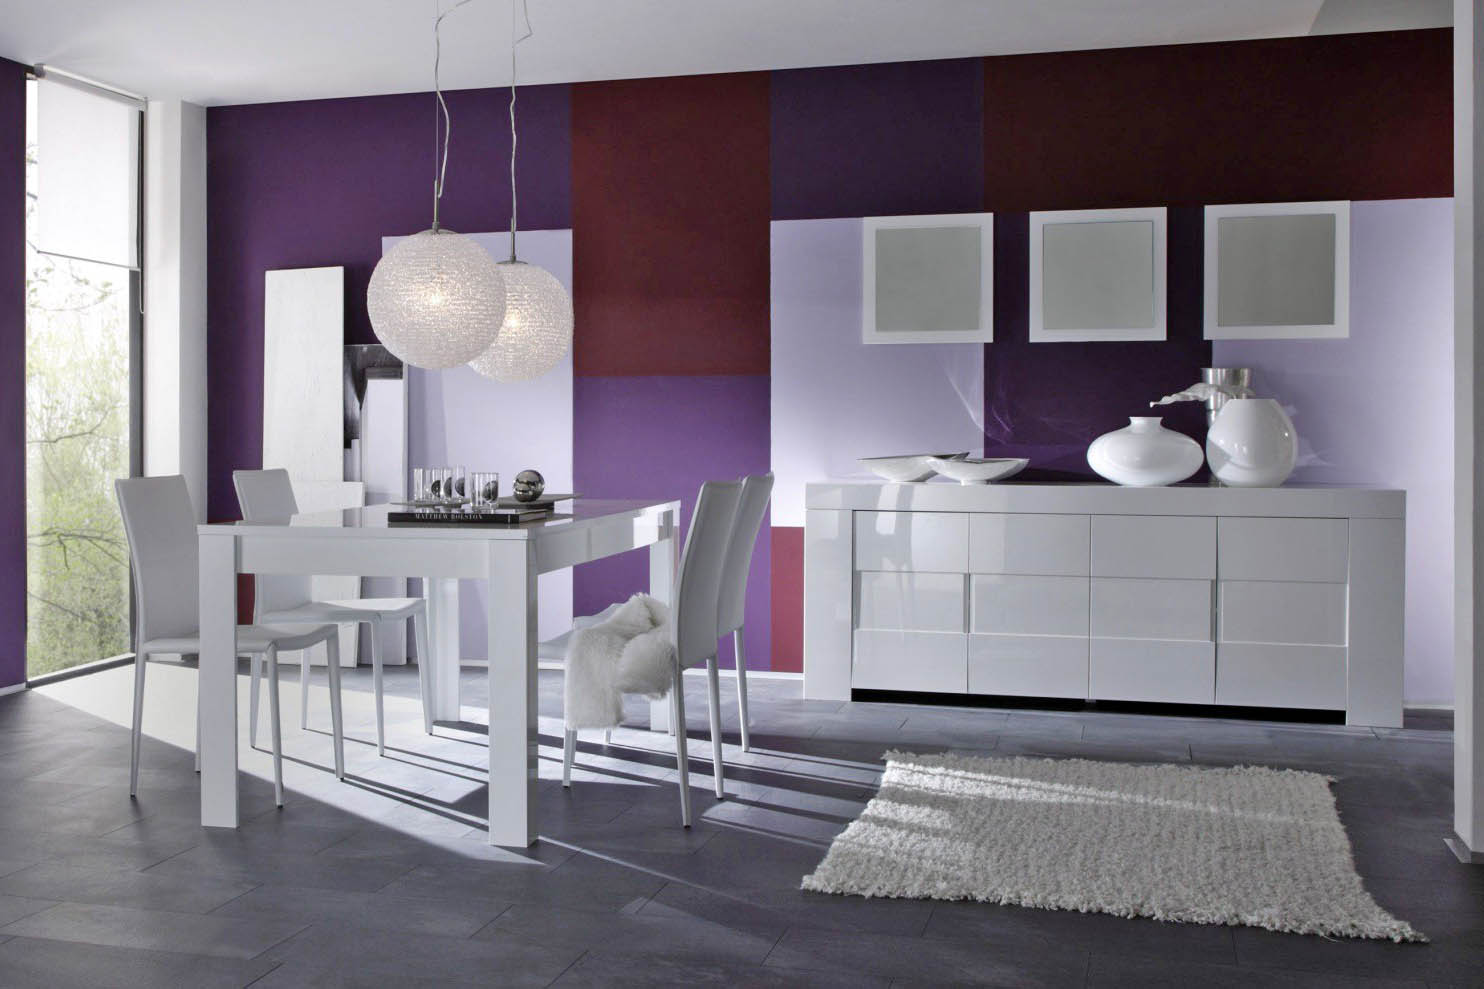 Salle manger meubl et design blanc meuble et d coration marseille mobi - Meuble de salle a manger ...